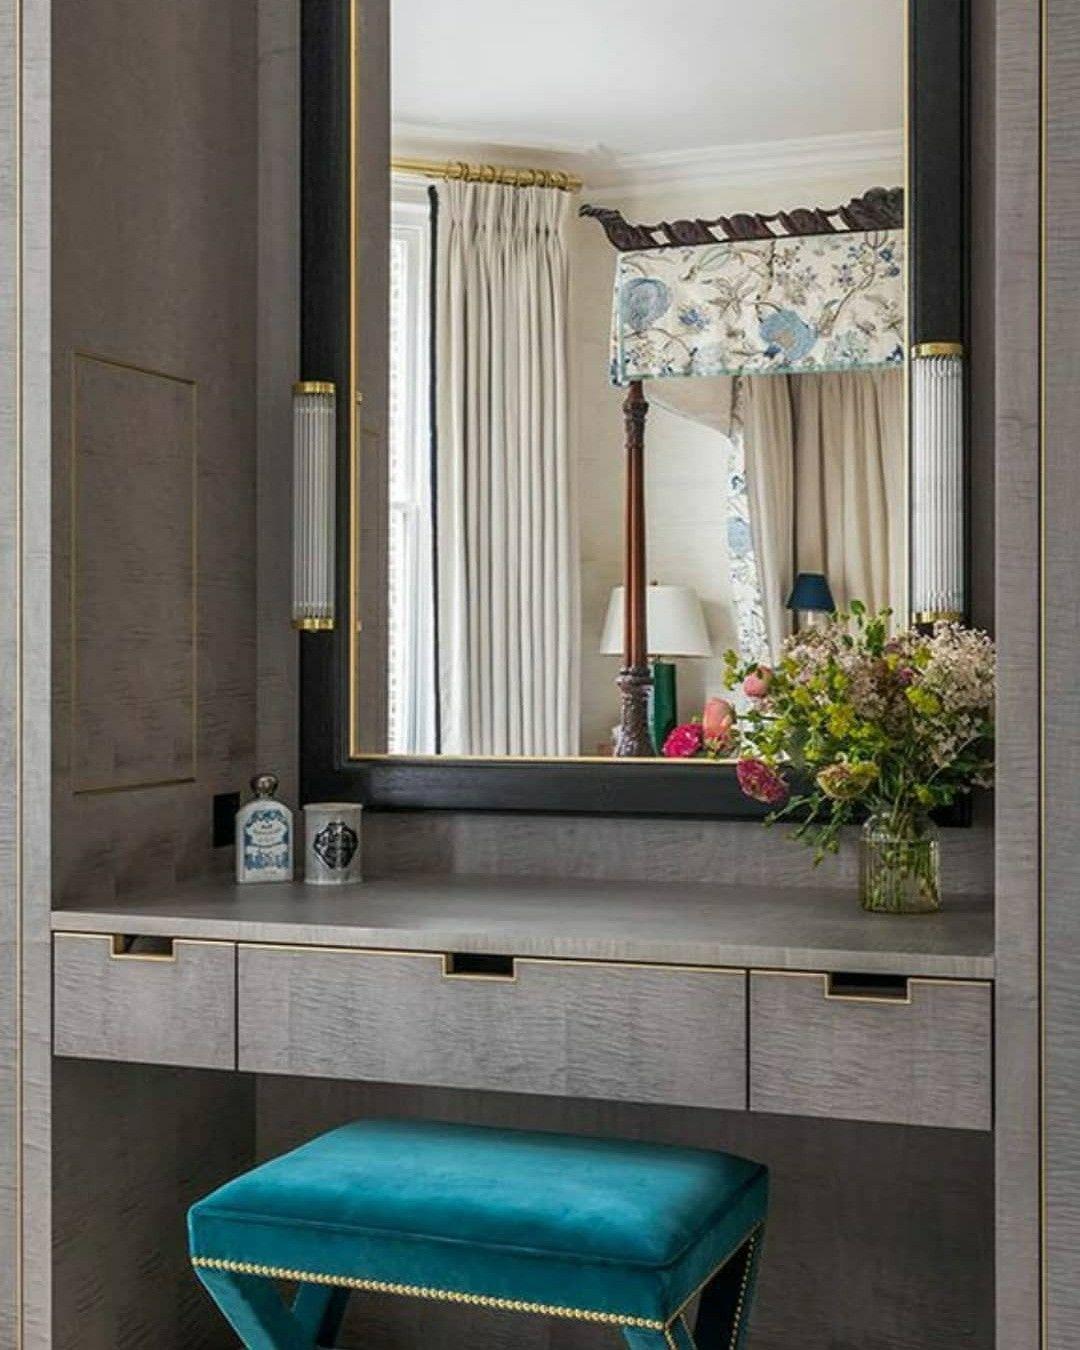 ديكور تسريحه ديكورات خشب ديكور خشب غرف النوم تفصيل خشب ديكورات لتواصل الرياض 0535711713 Cool House Designs Home Decor Styles House Styles